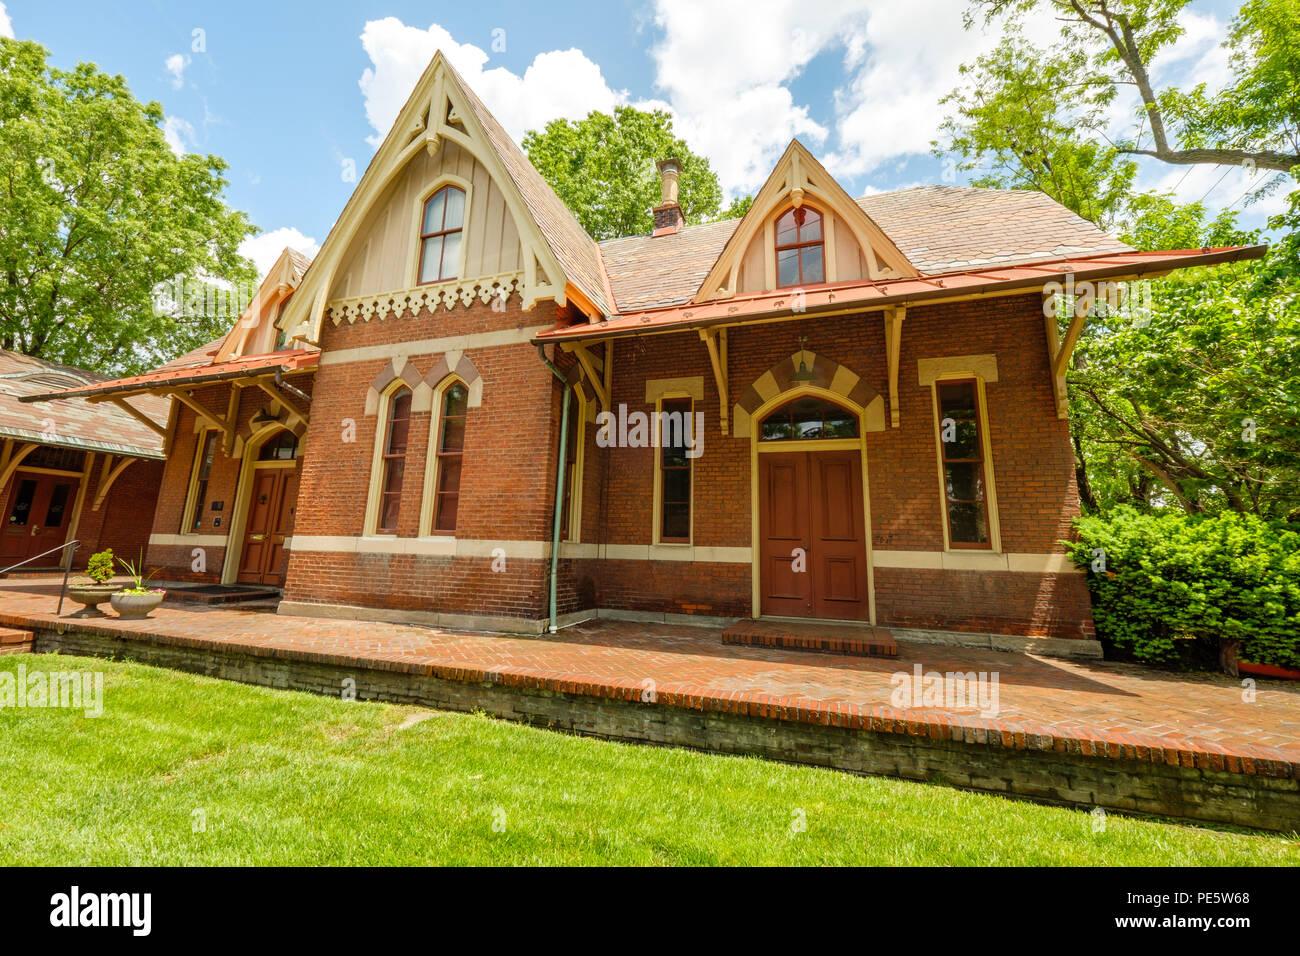 Rockville Railroad Station, 98 Church Street, Rockville, Maryland - Stock Image